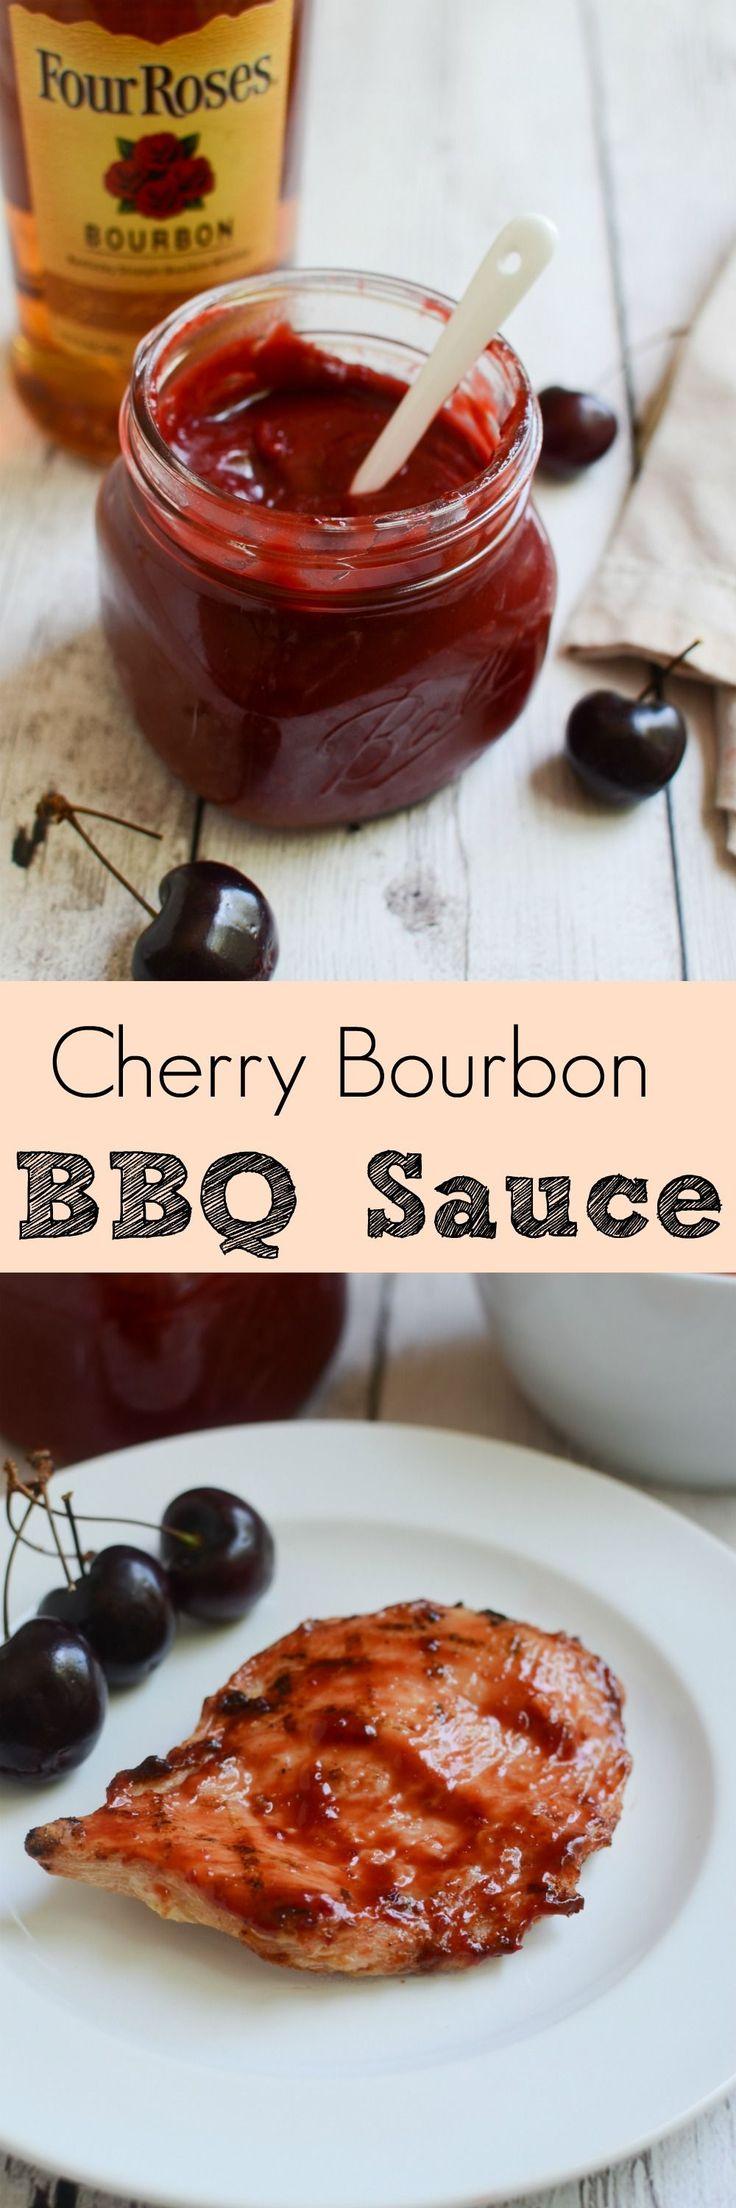 ... bourbon and vanilla brined pork chops orange whiskey bbq sauce robust